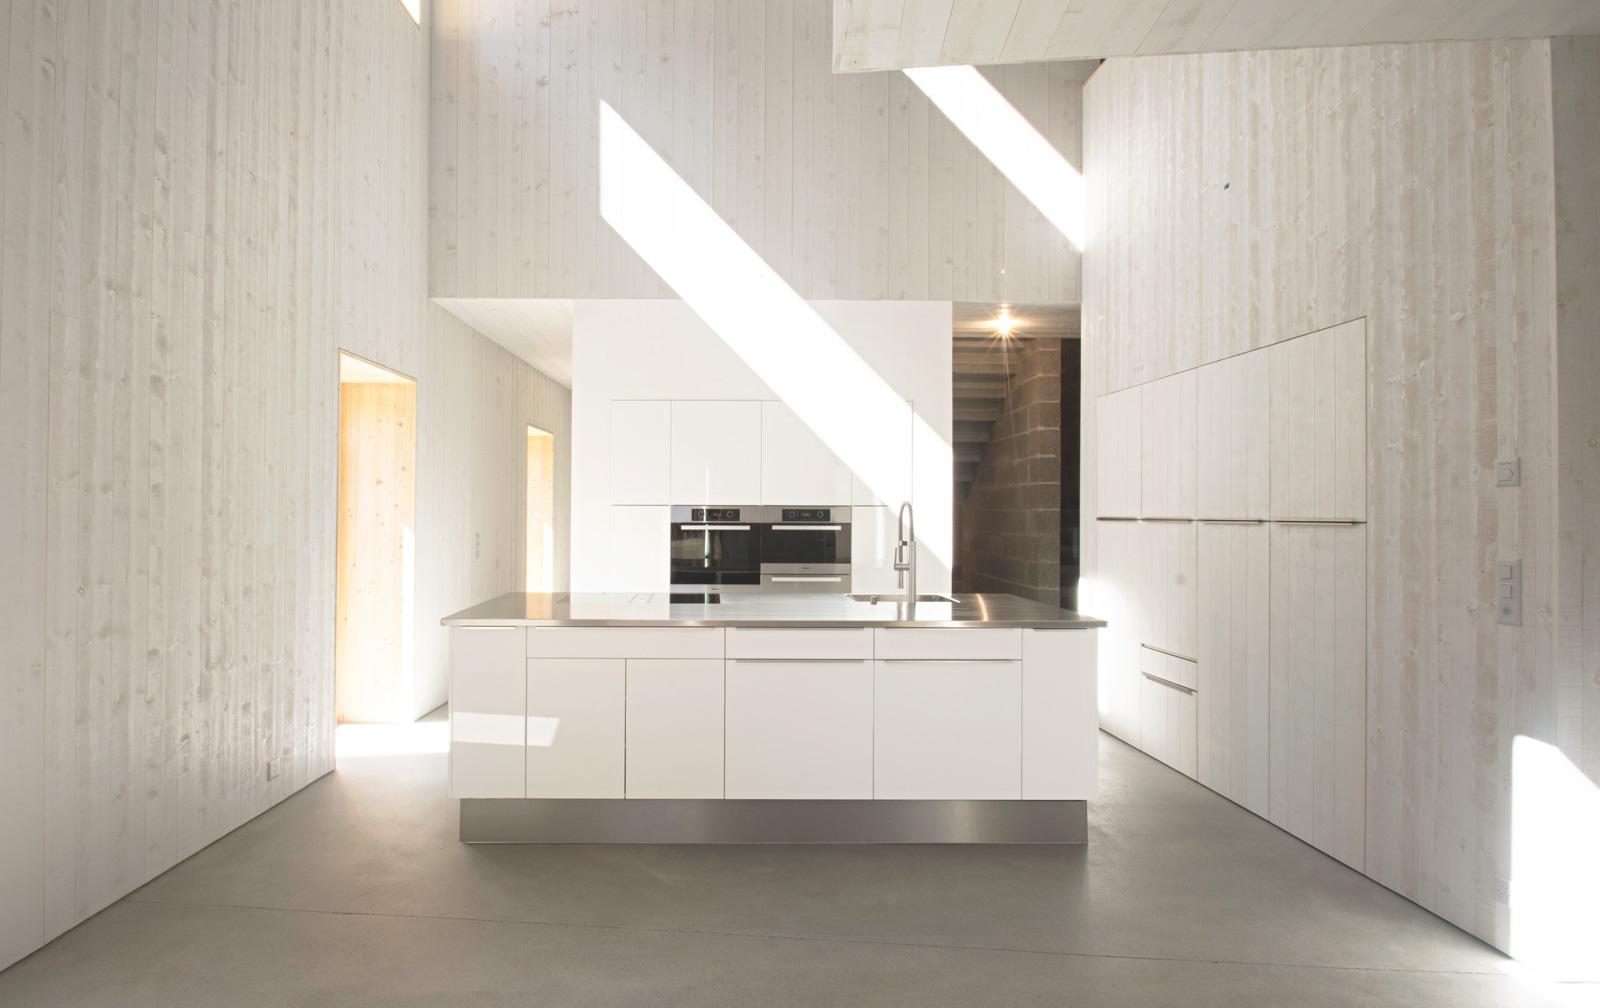 Projet maison Blattmann - atelier d'architecture Game